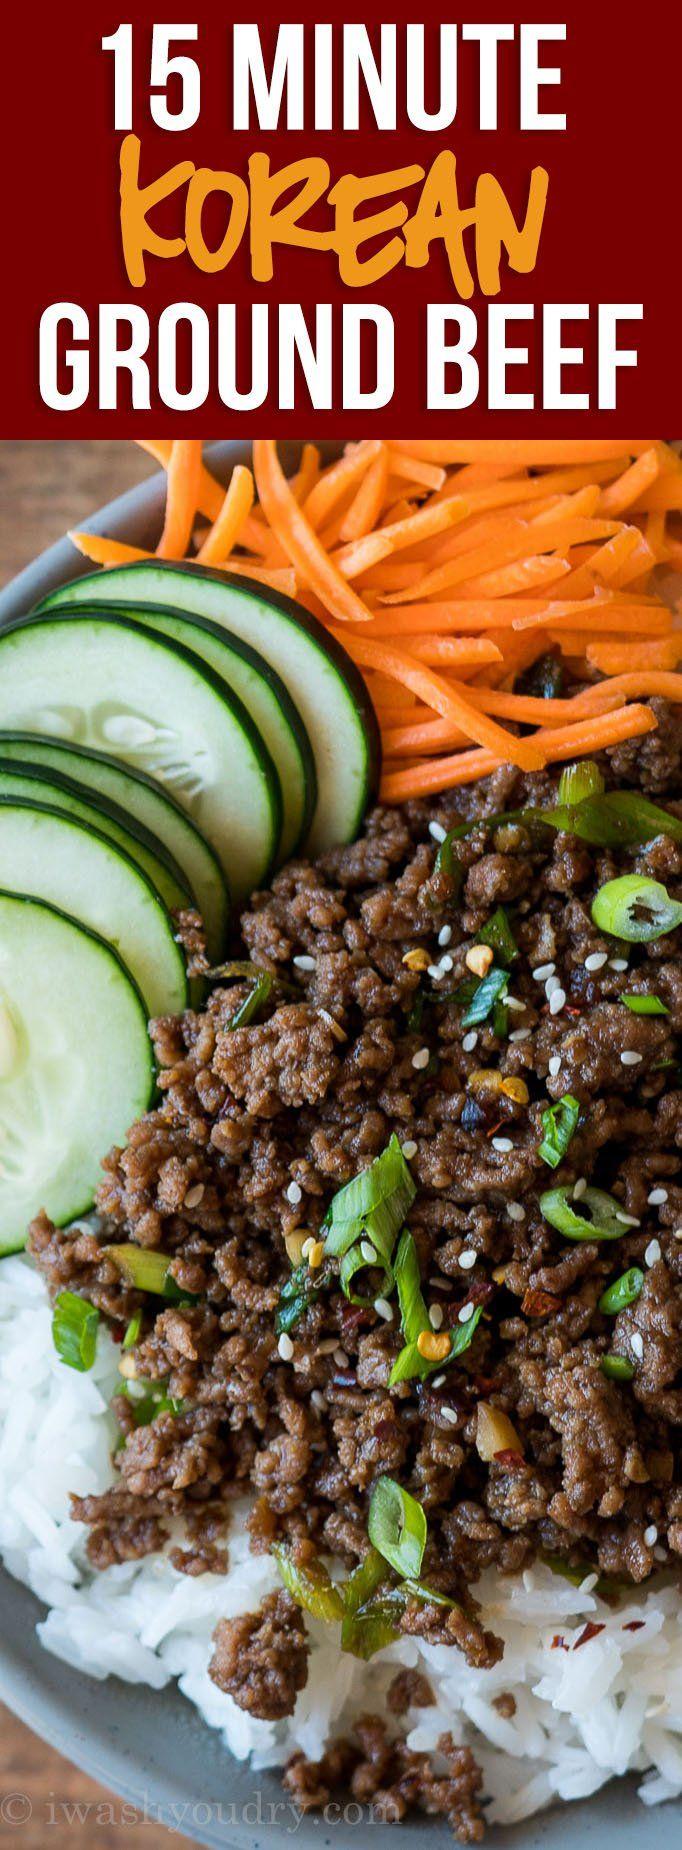 Easy Korean Ground Beef Recipe Recipe In 2020 Dinner With Ground Beef Beef Dinner Beef Recipes For Dinner